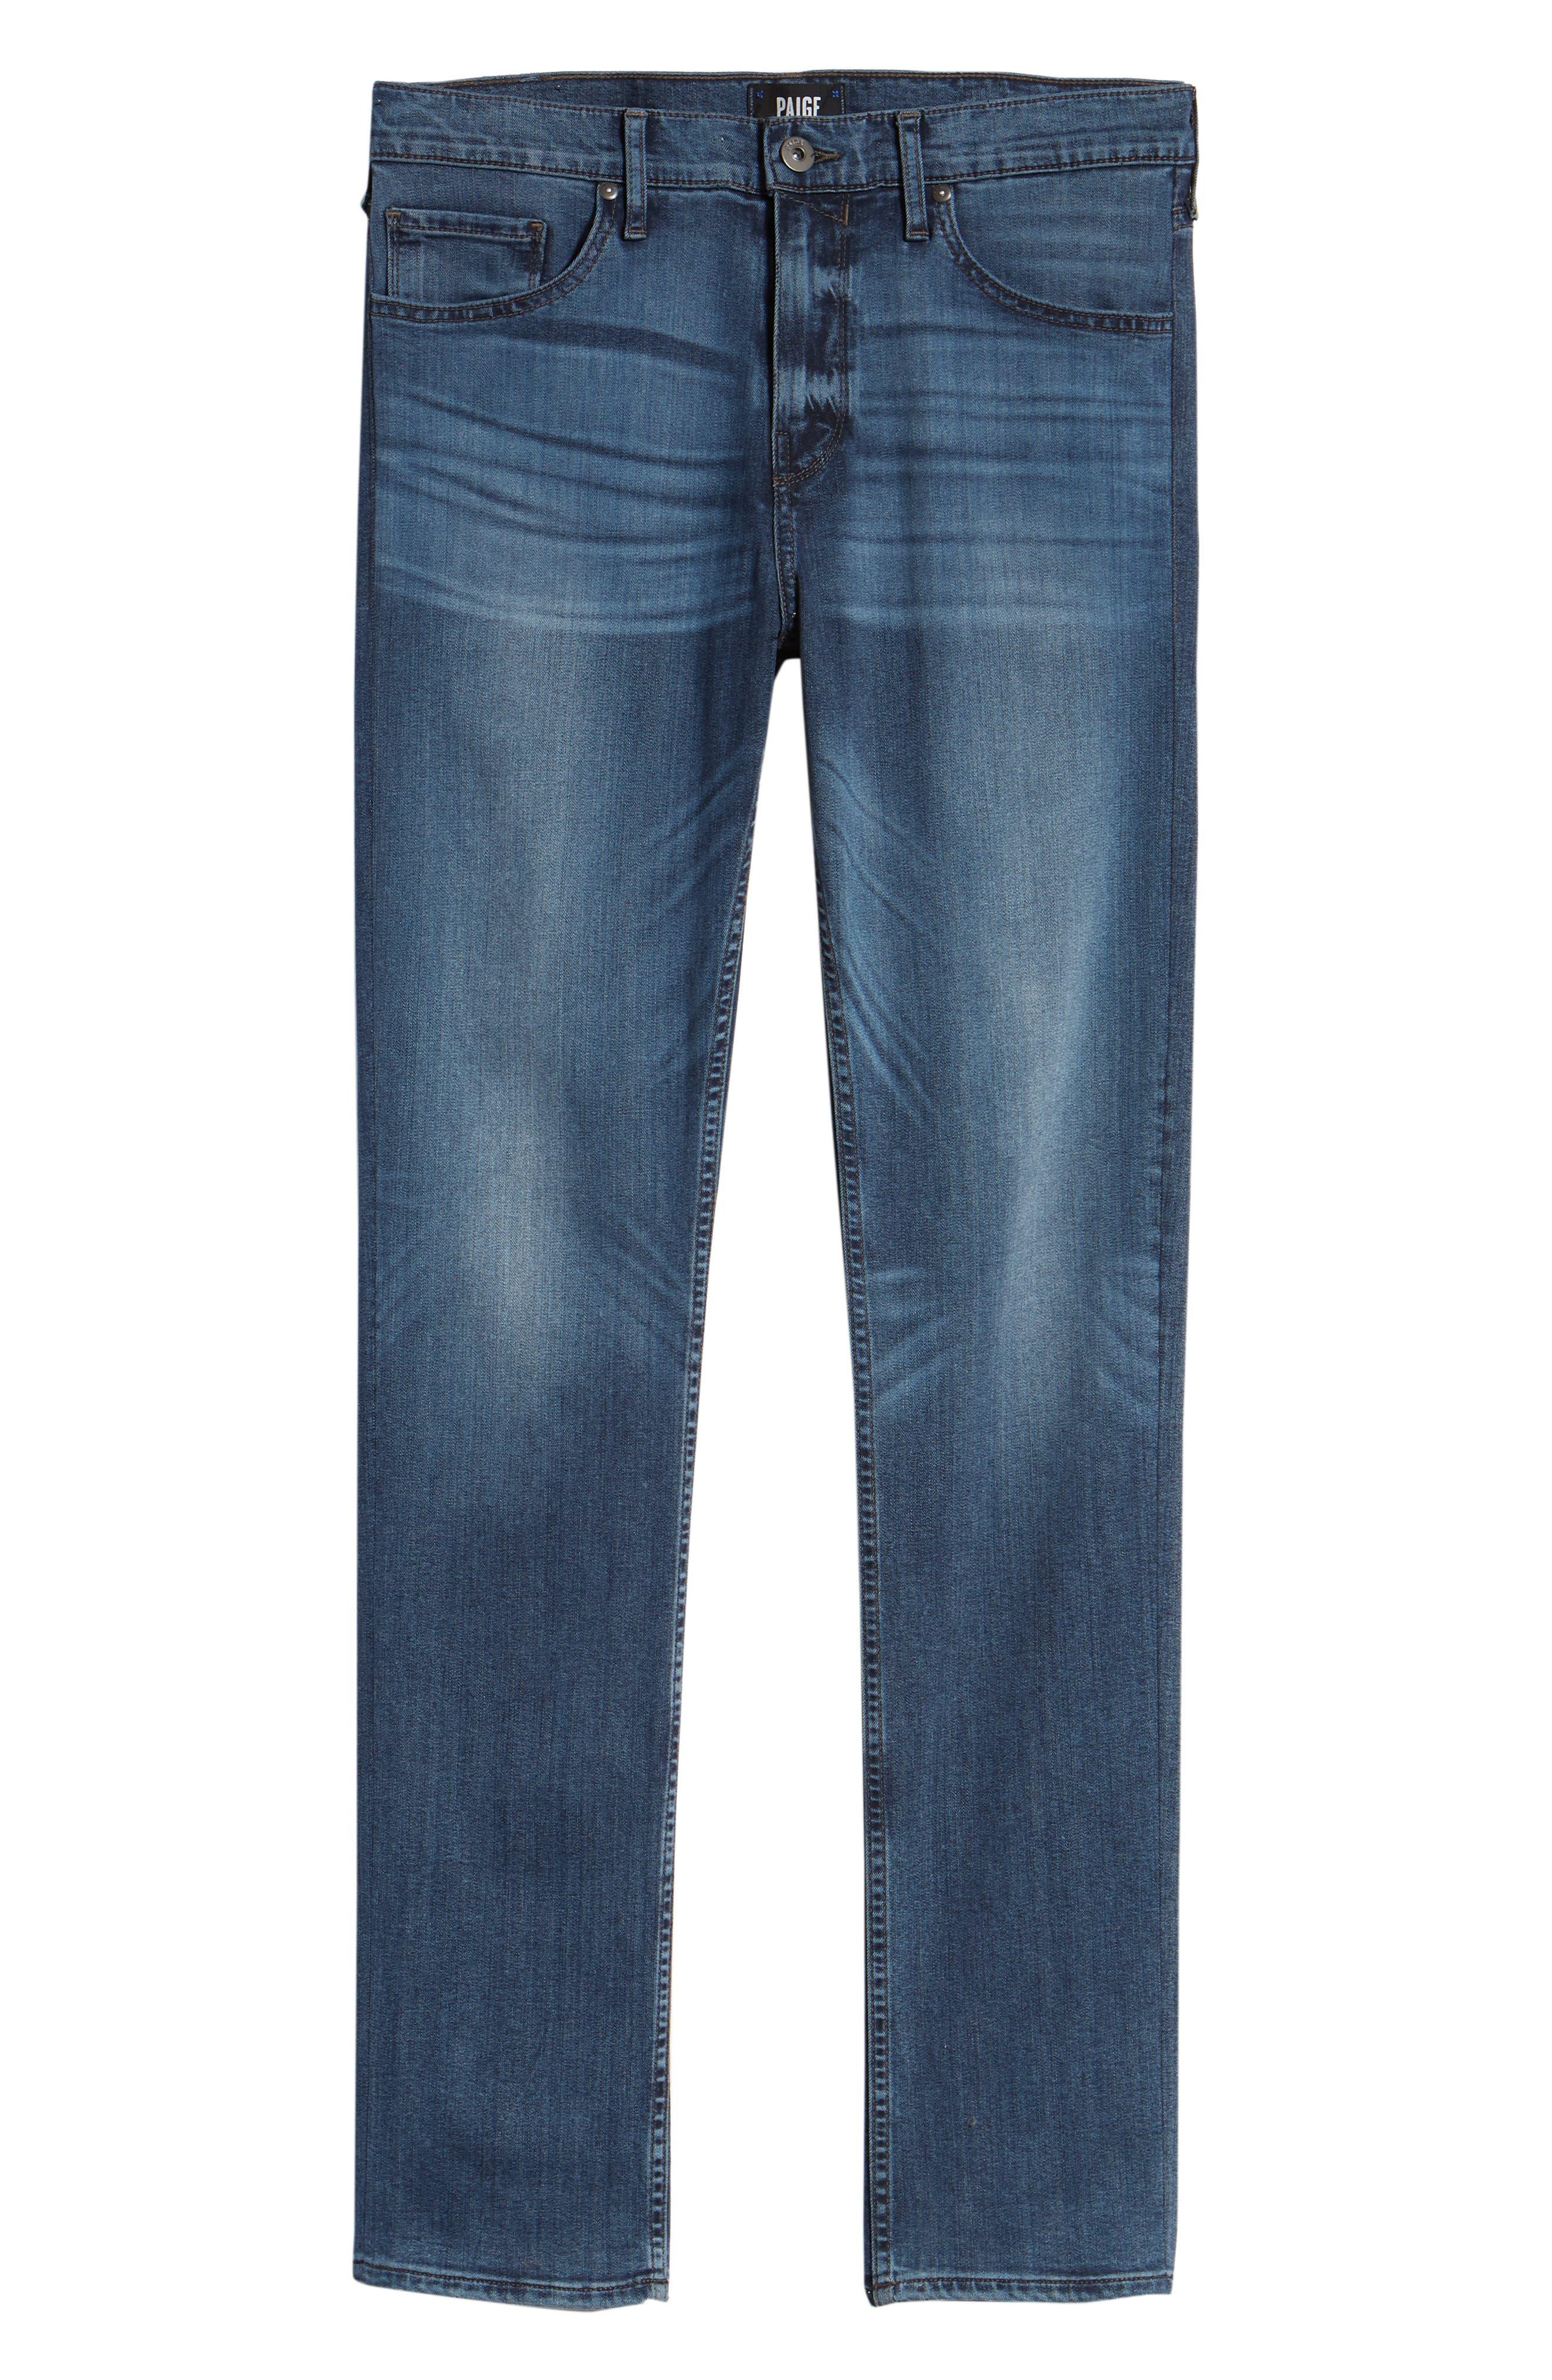 Transcend - Lennox Slim Fit Jeans,                             Alternate thumbnail 6, color,                             Grammercy